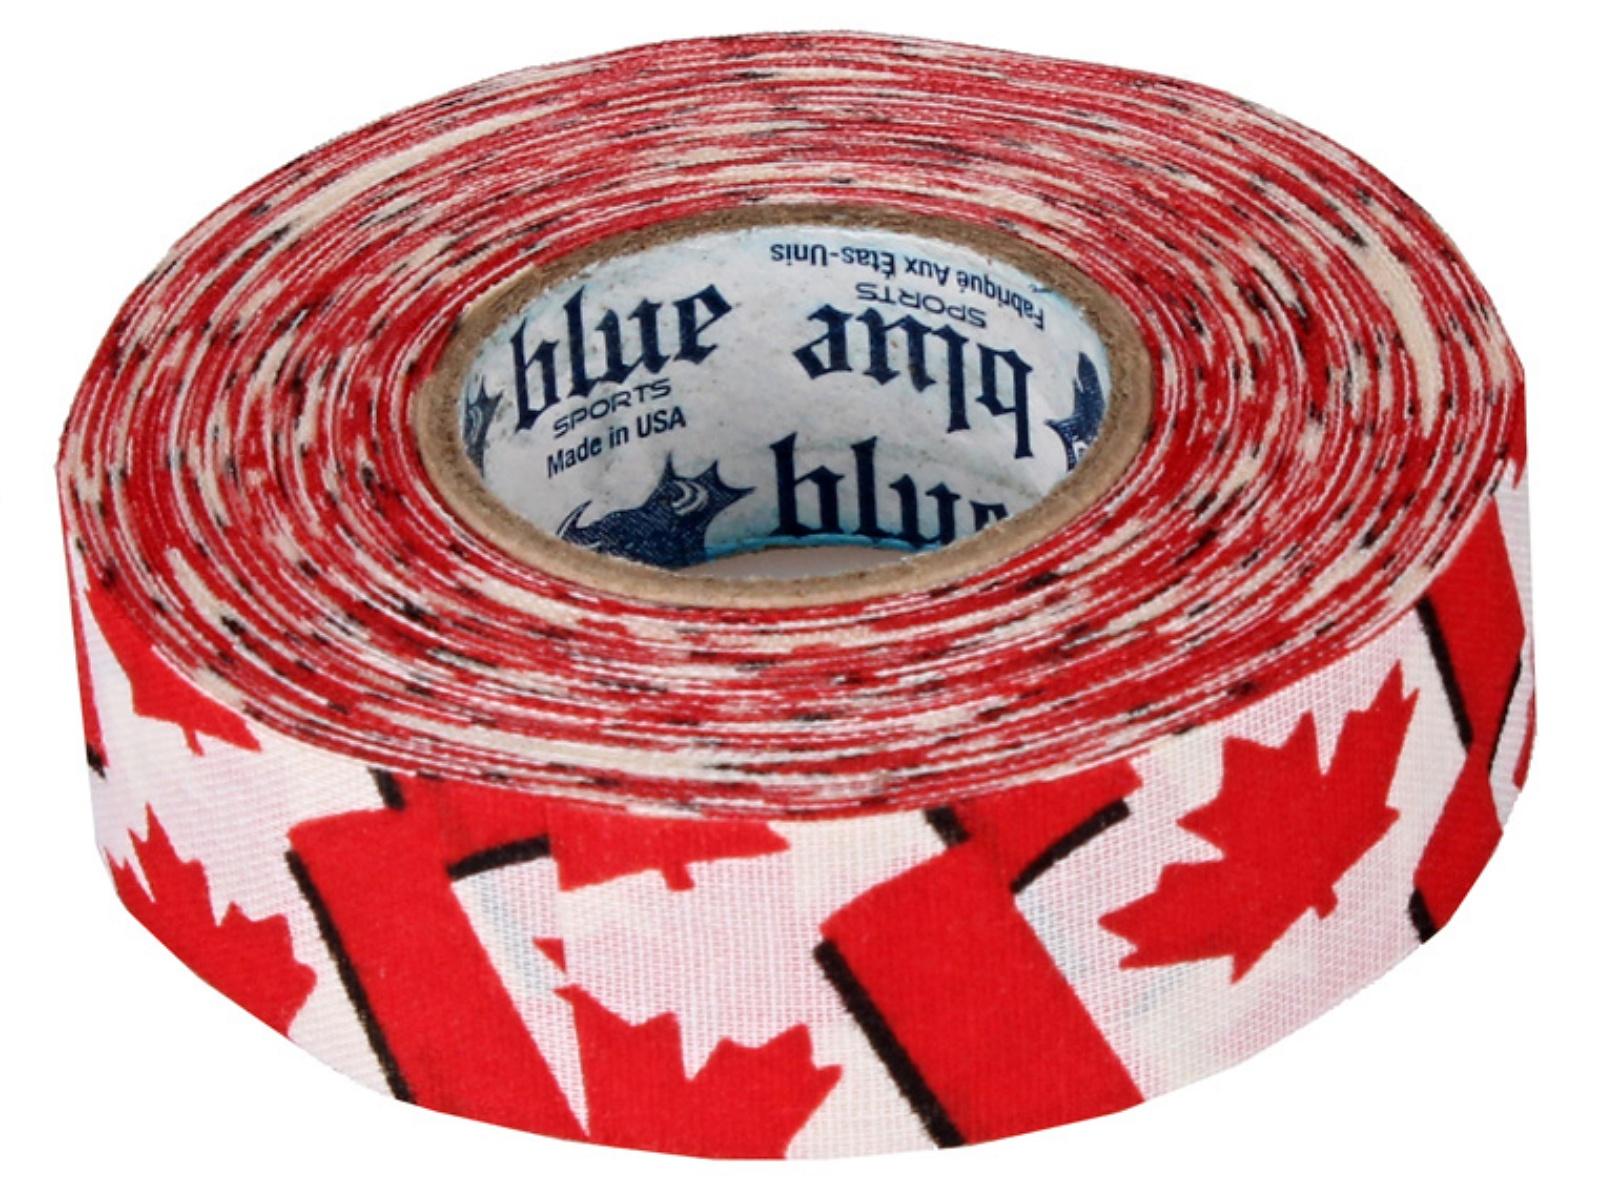 Hokejová páska BLUE Sport 18 m x 2,4 cm, netrhací - Canada